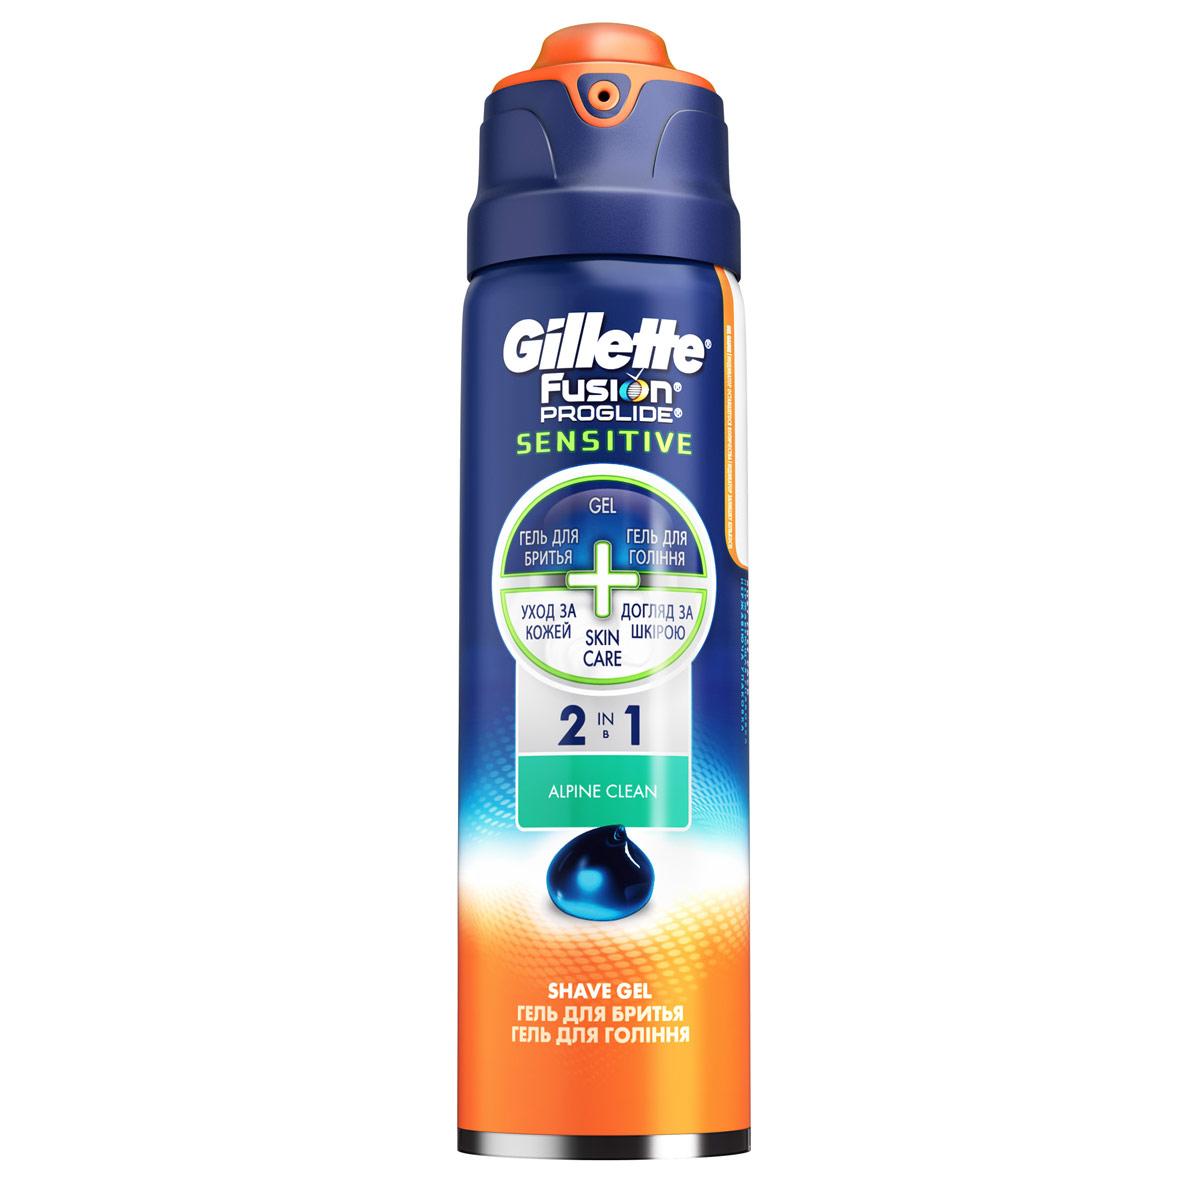 Gillette Гель для бритья Fusion ProGlide Sensitive 2-в-1 Alpine Clean, 170 мл